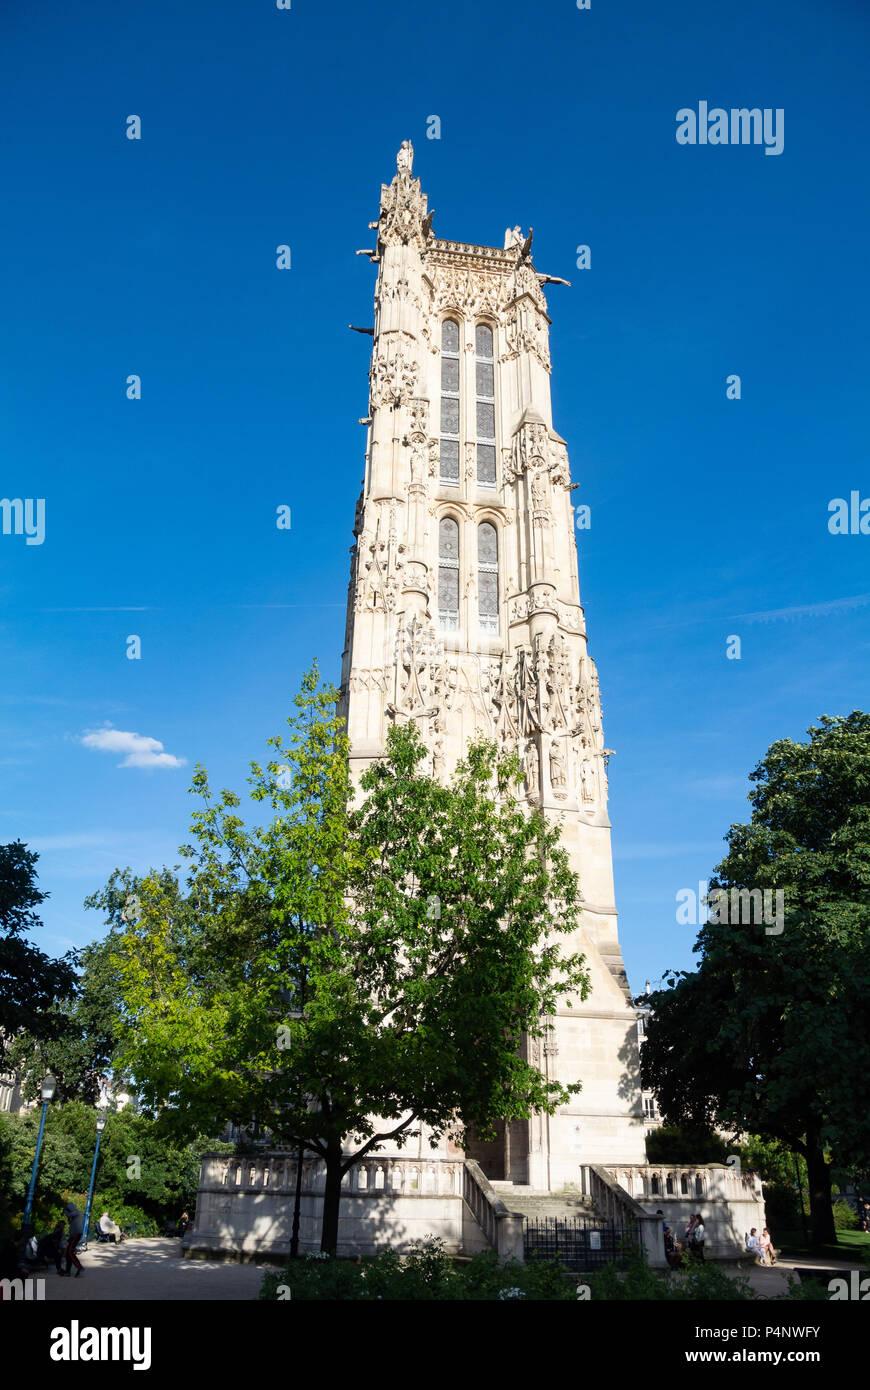 saint jacques tower stock photos saint jacques tower stock images alamy. Black Bedroom Furniture Sets. Home Design Ideas